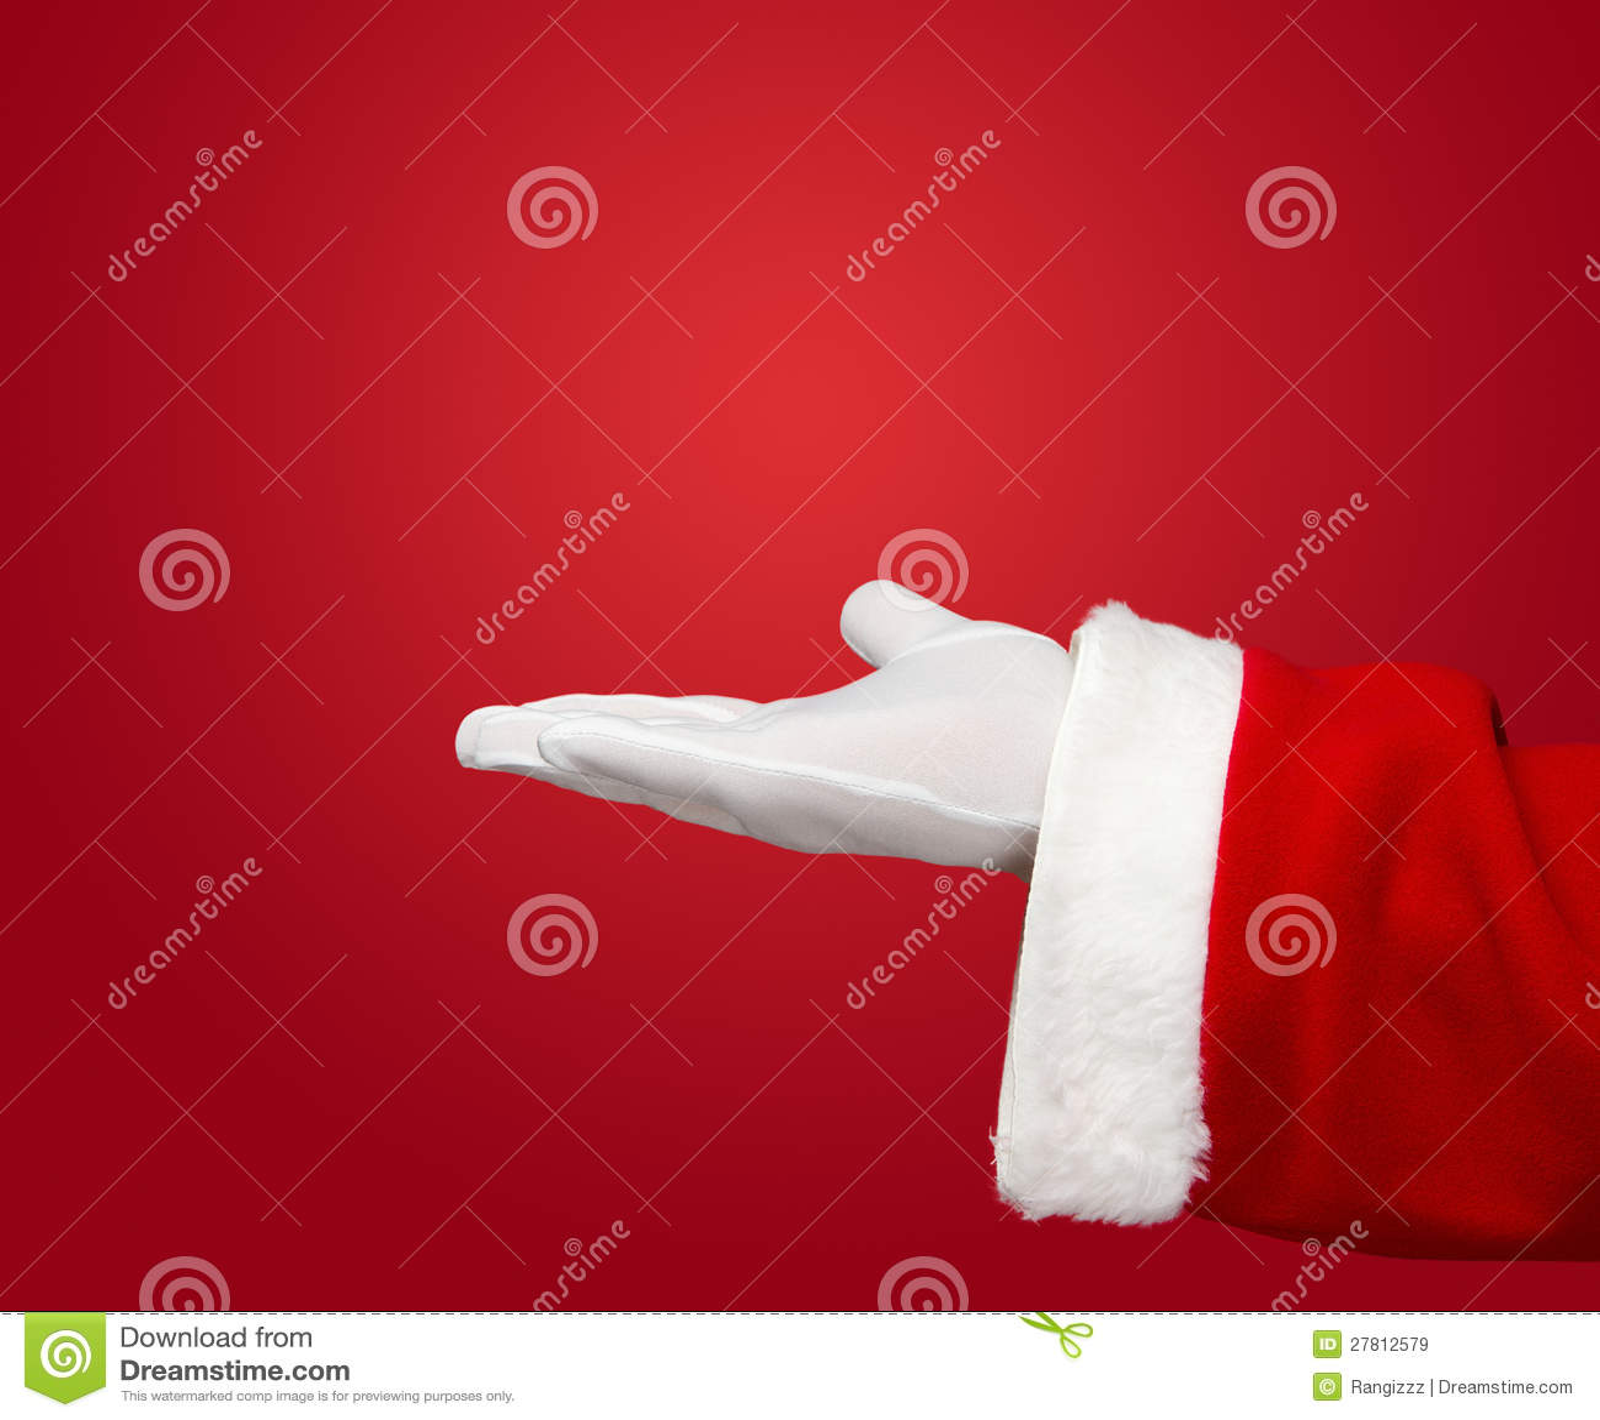 santa claus open hand stock image  image of human  present